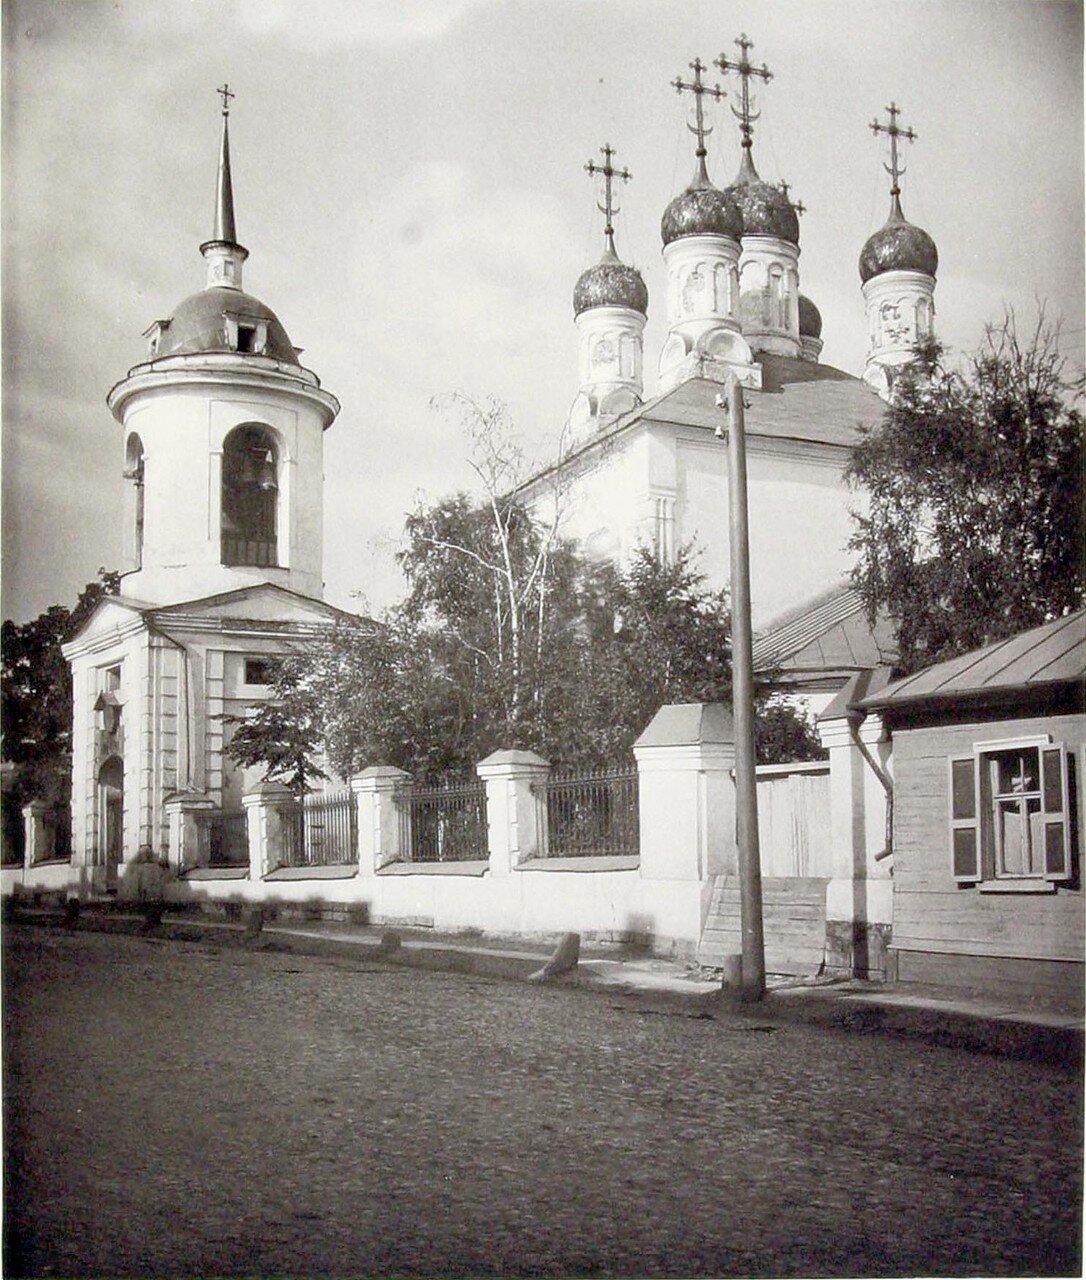 381. Церковь Алексия Митрополита на Глинищах